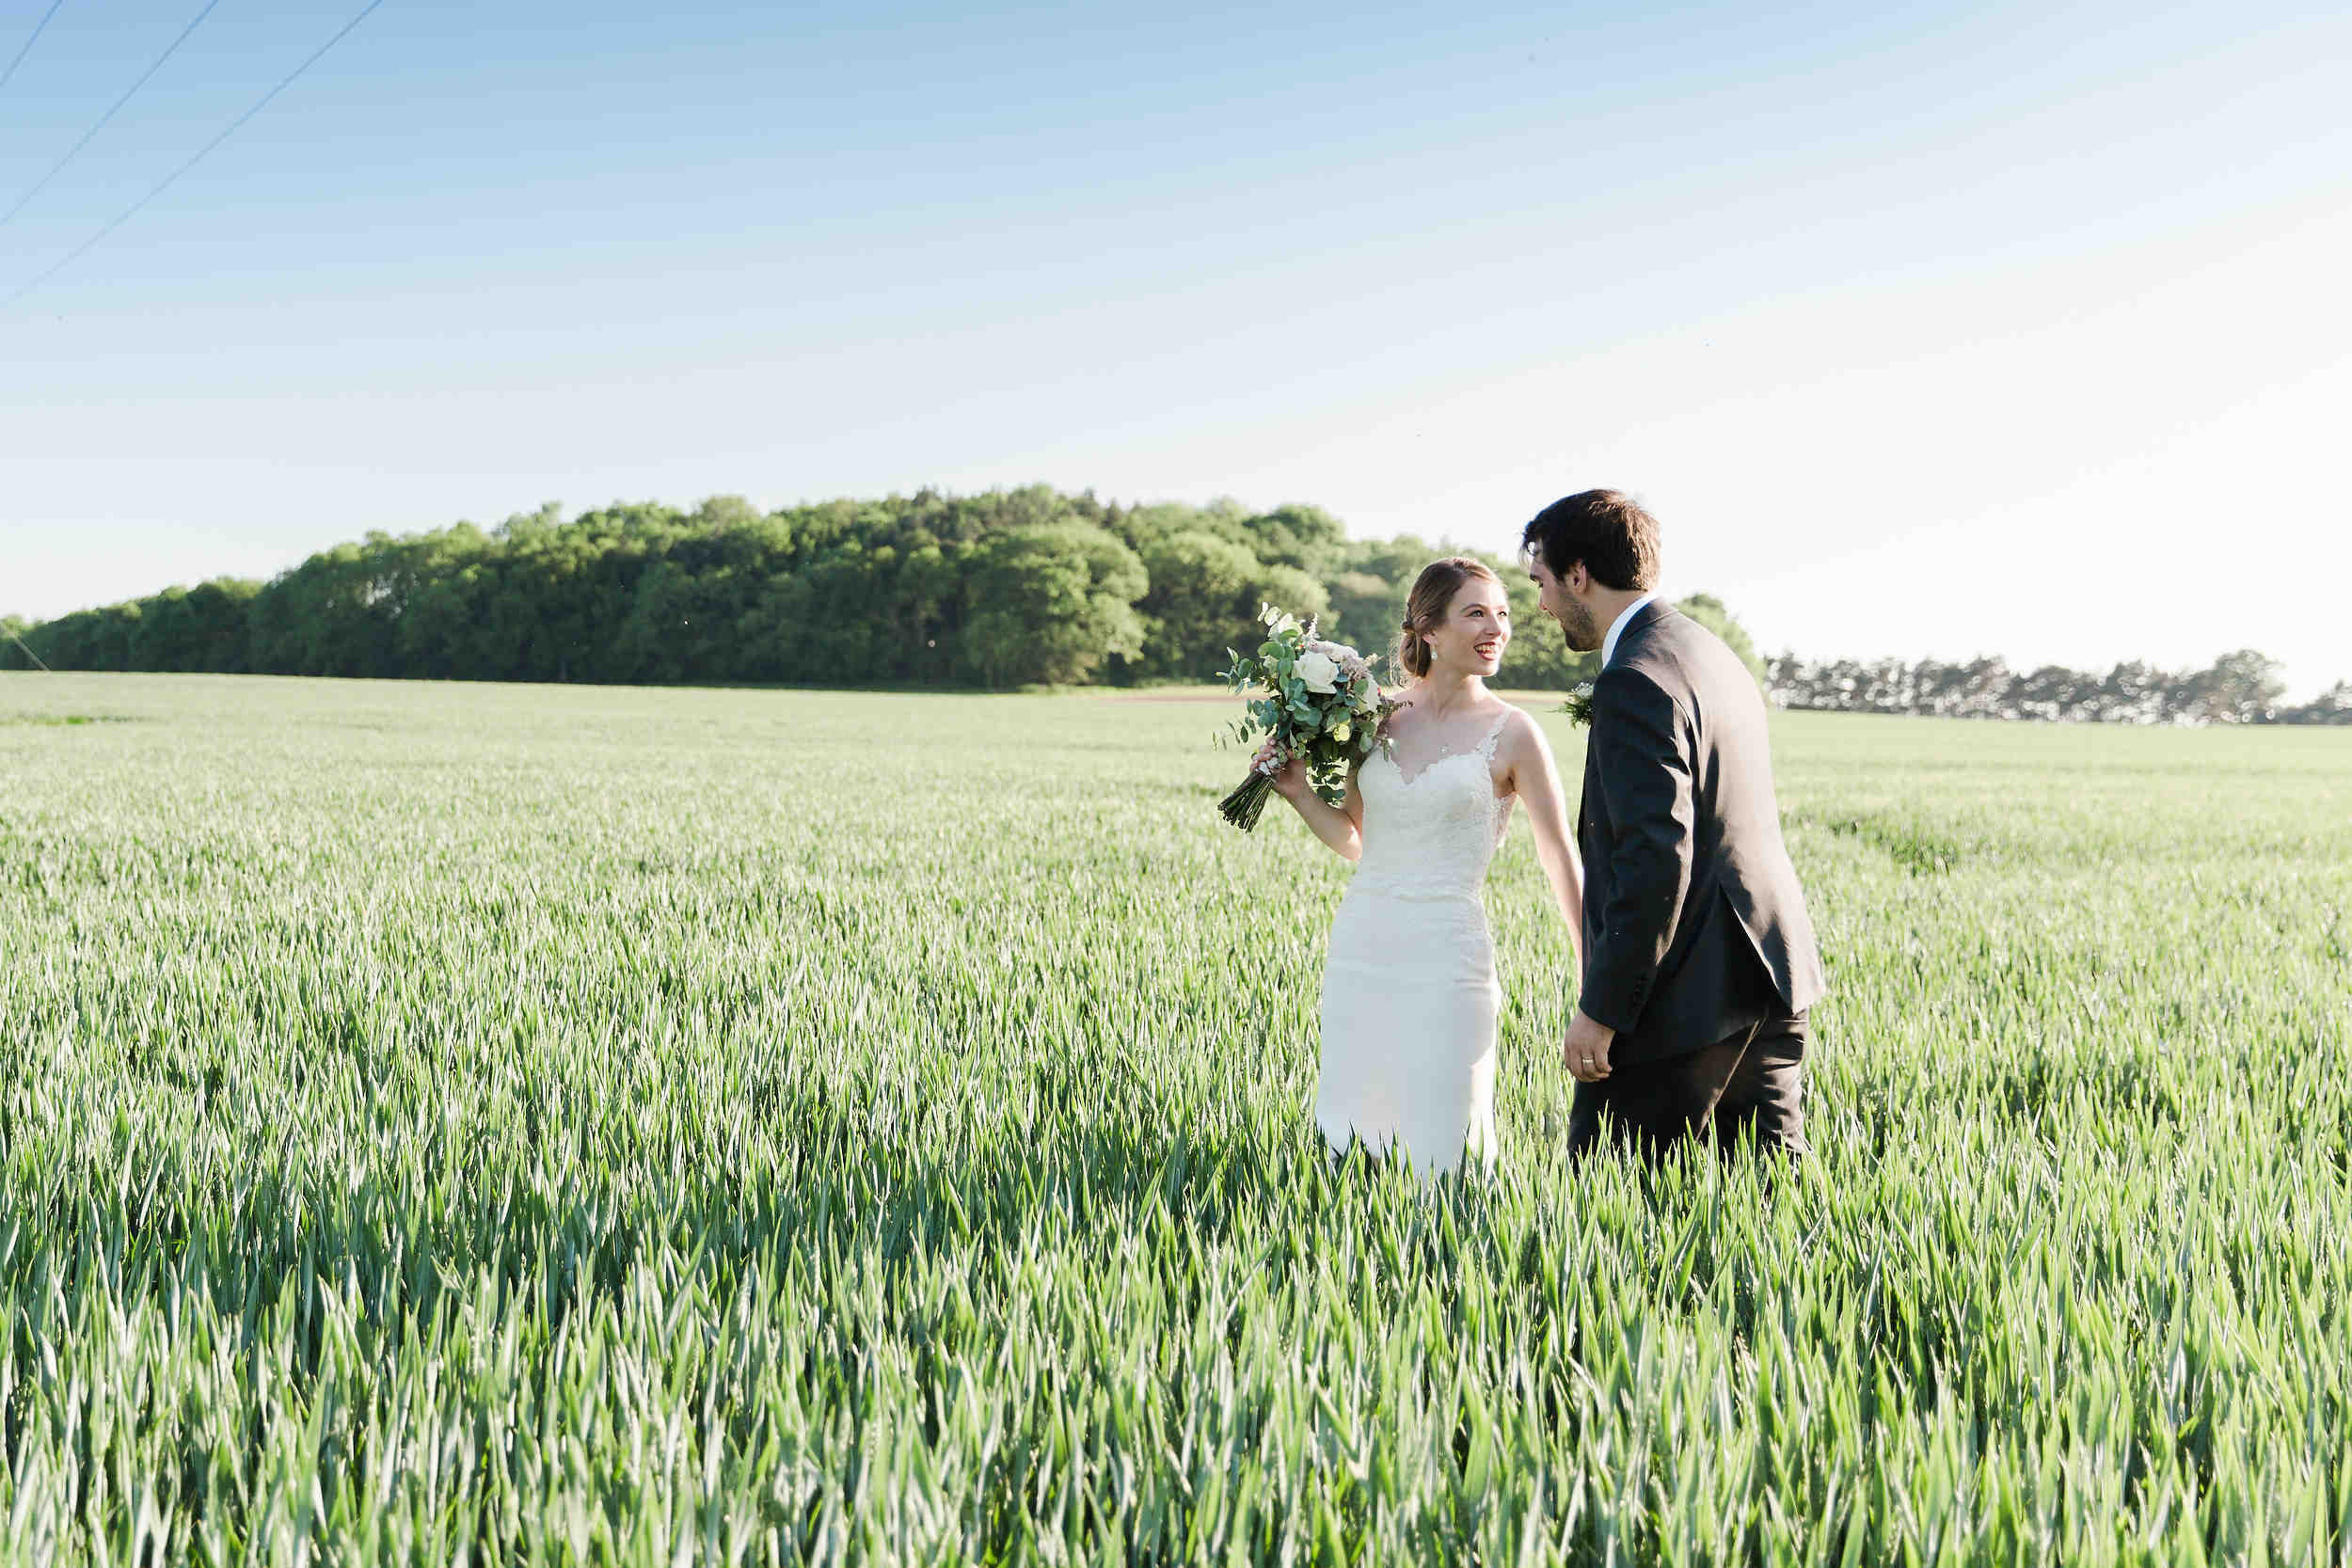 Modern_Stylish_Wedding_at_Swallows_Nest_Barn1268